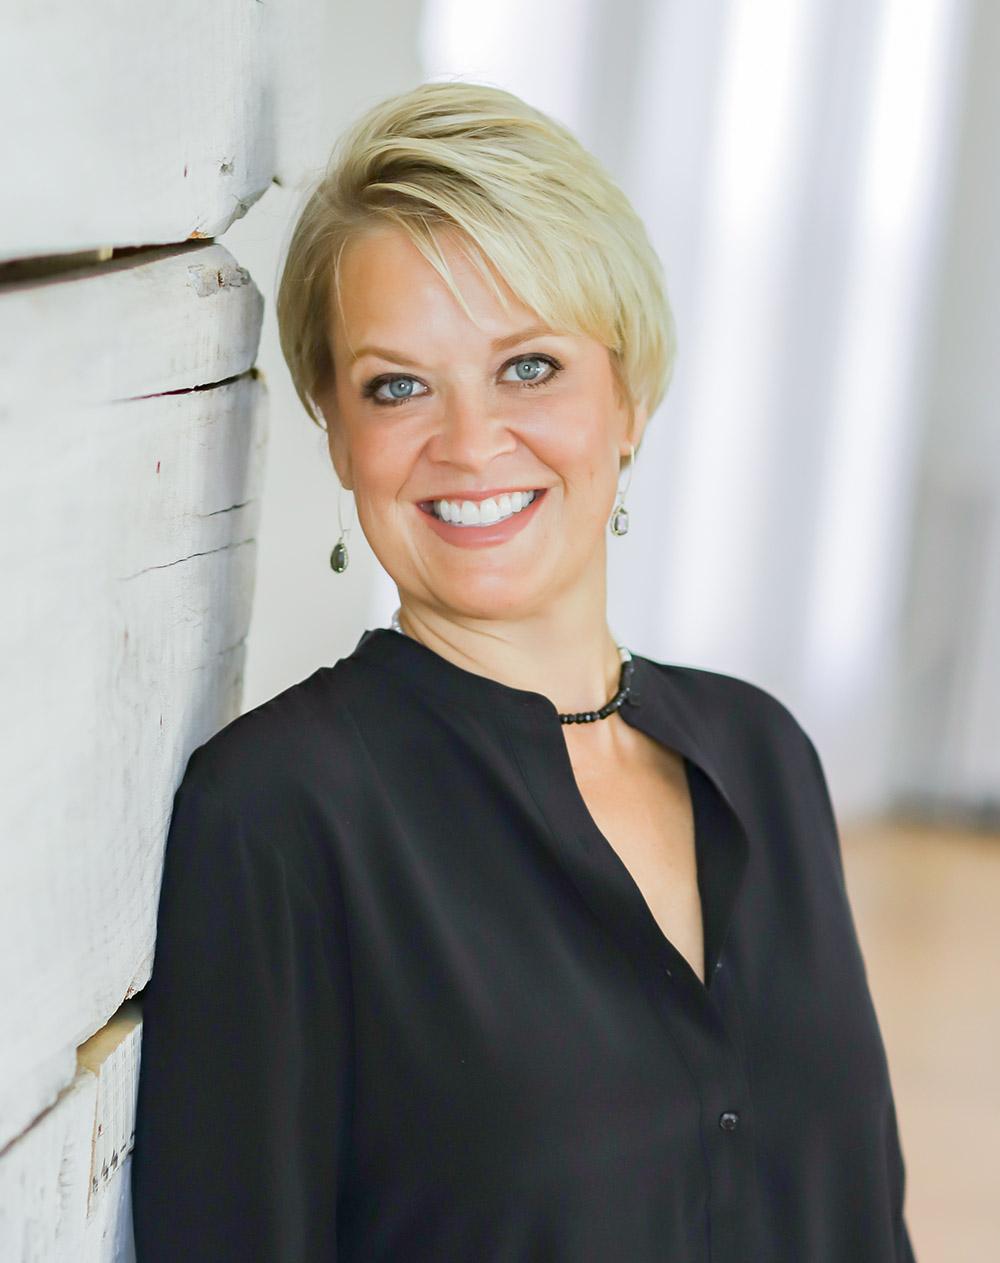 Lori Mullen